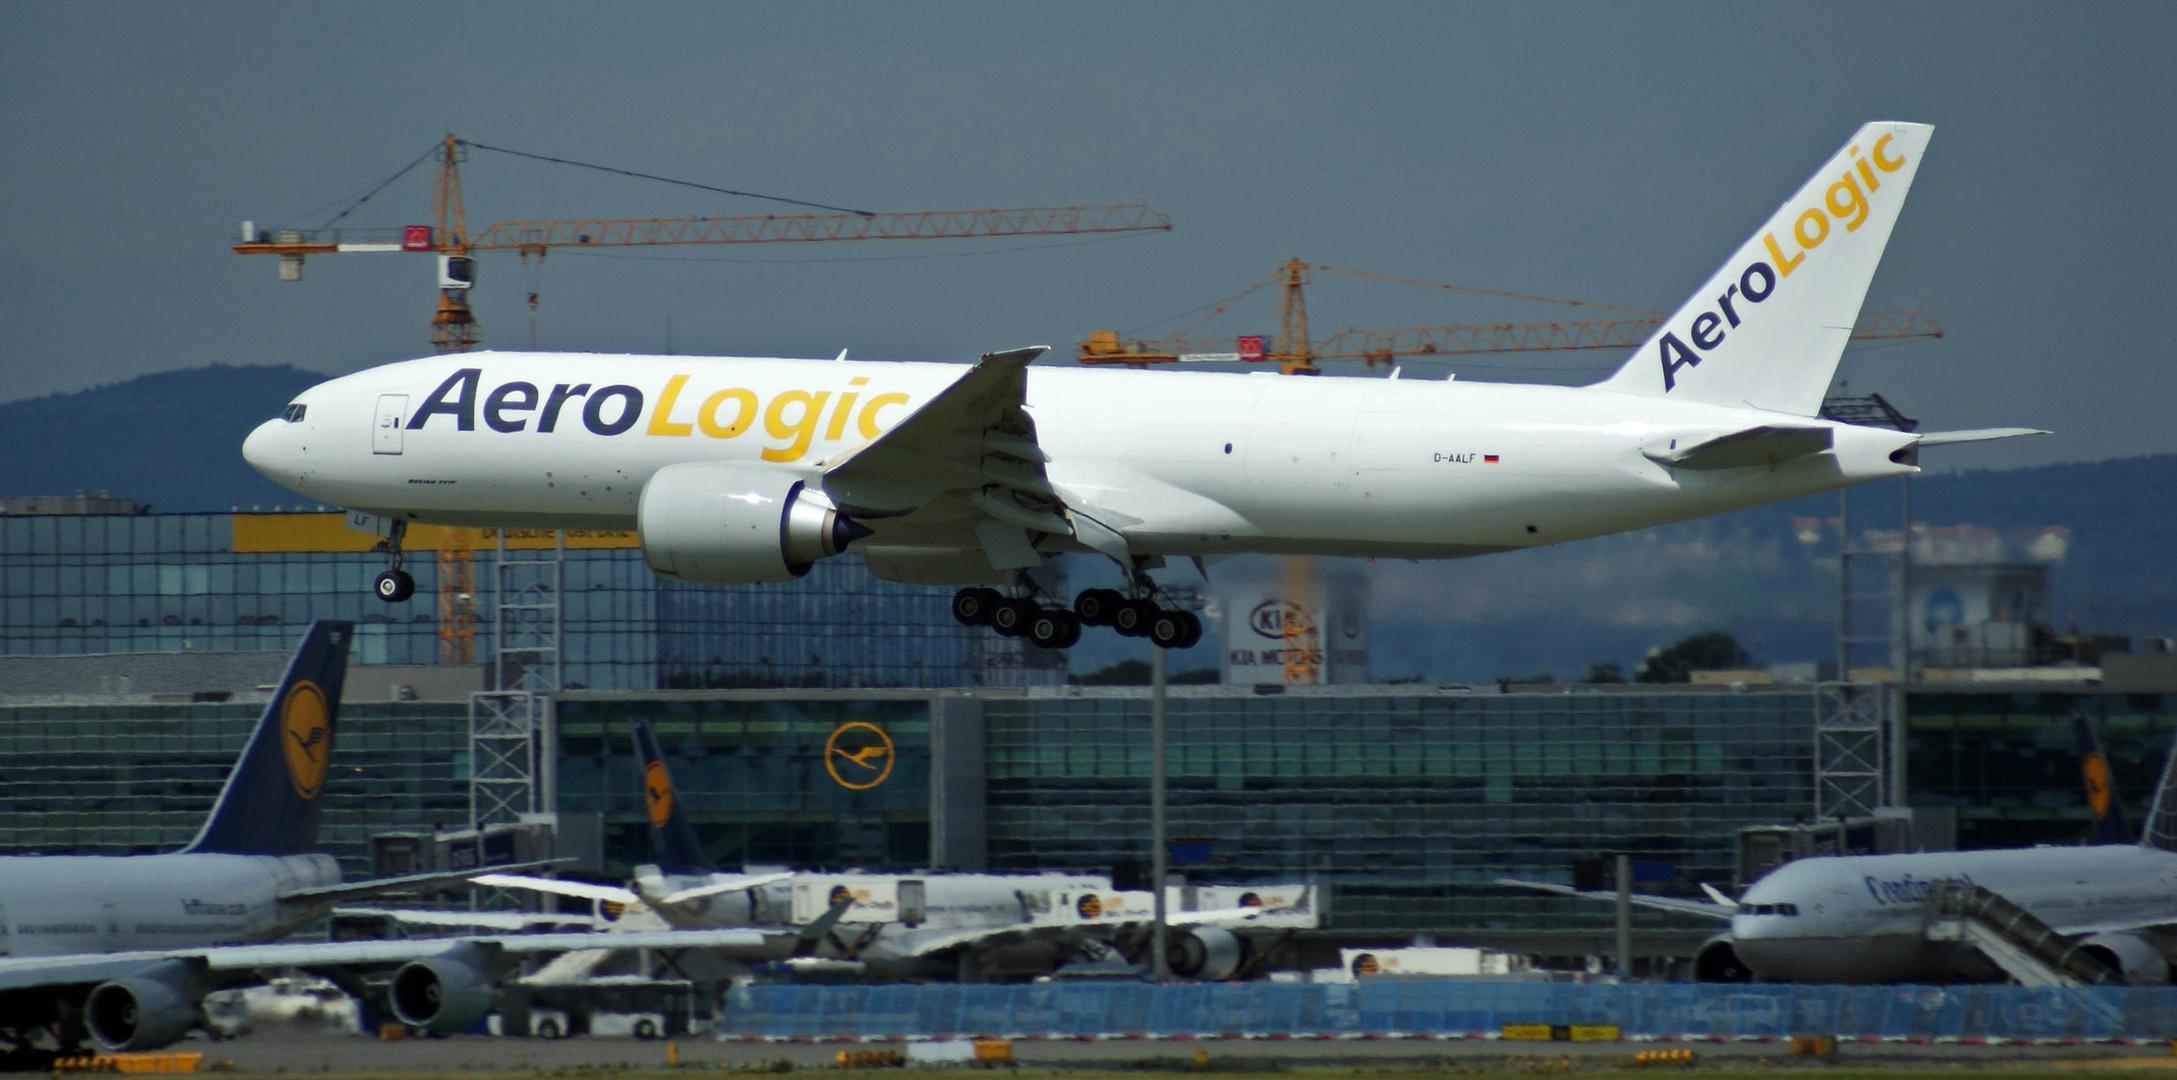 Aero Logic